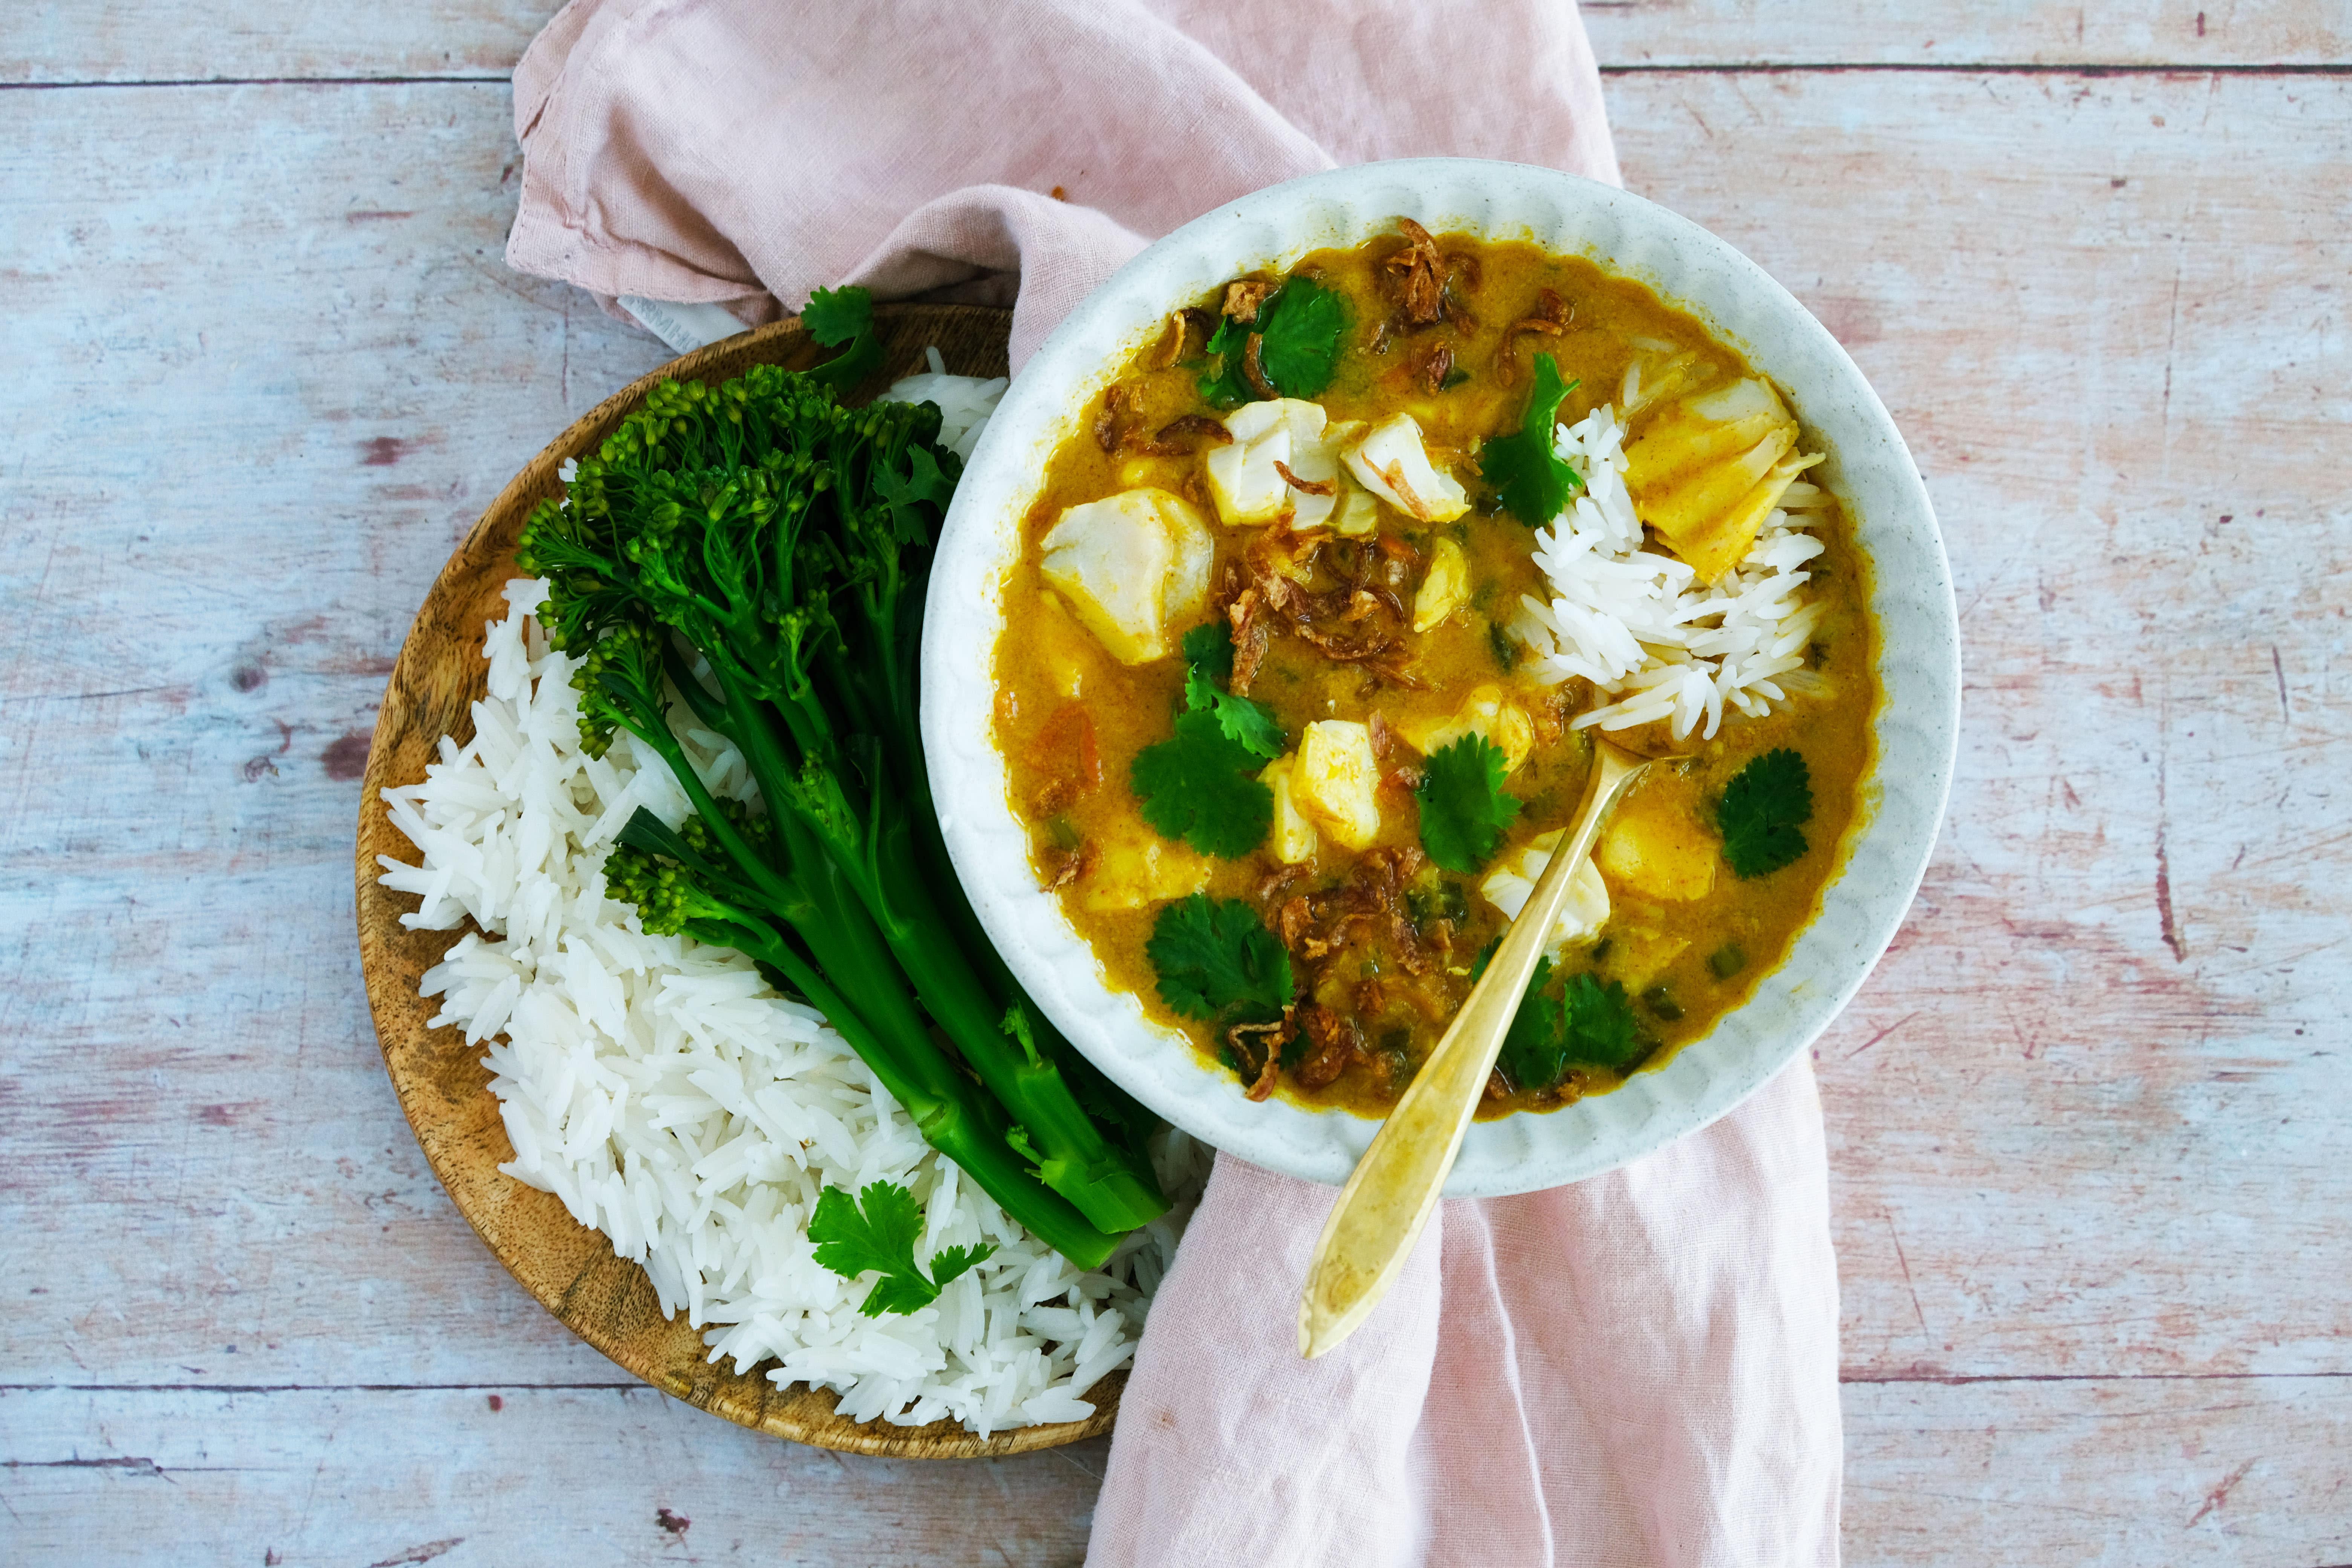 Goan Fish Curry with Basmati Rice and Tenderstem Broccoli